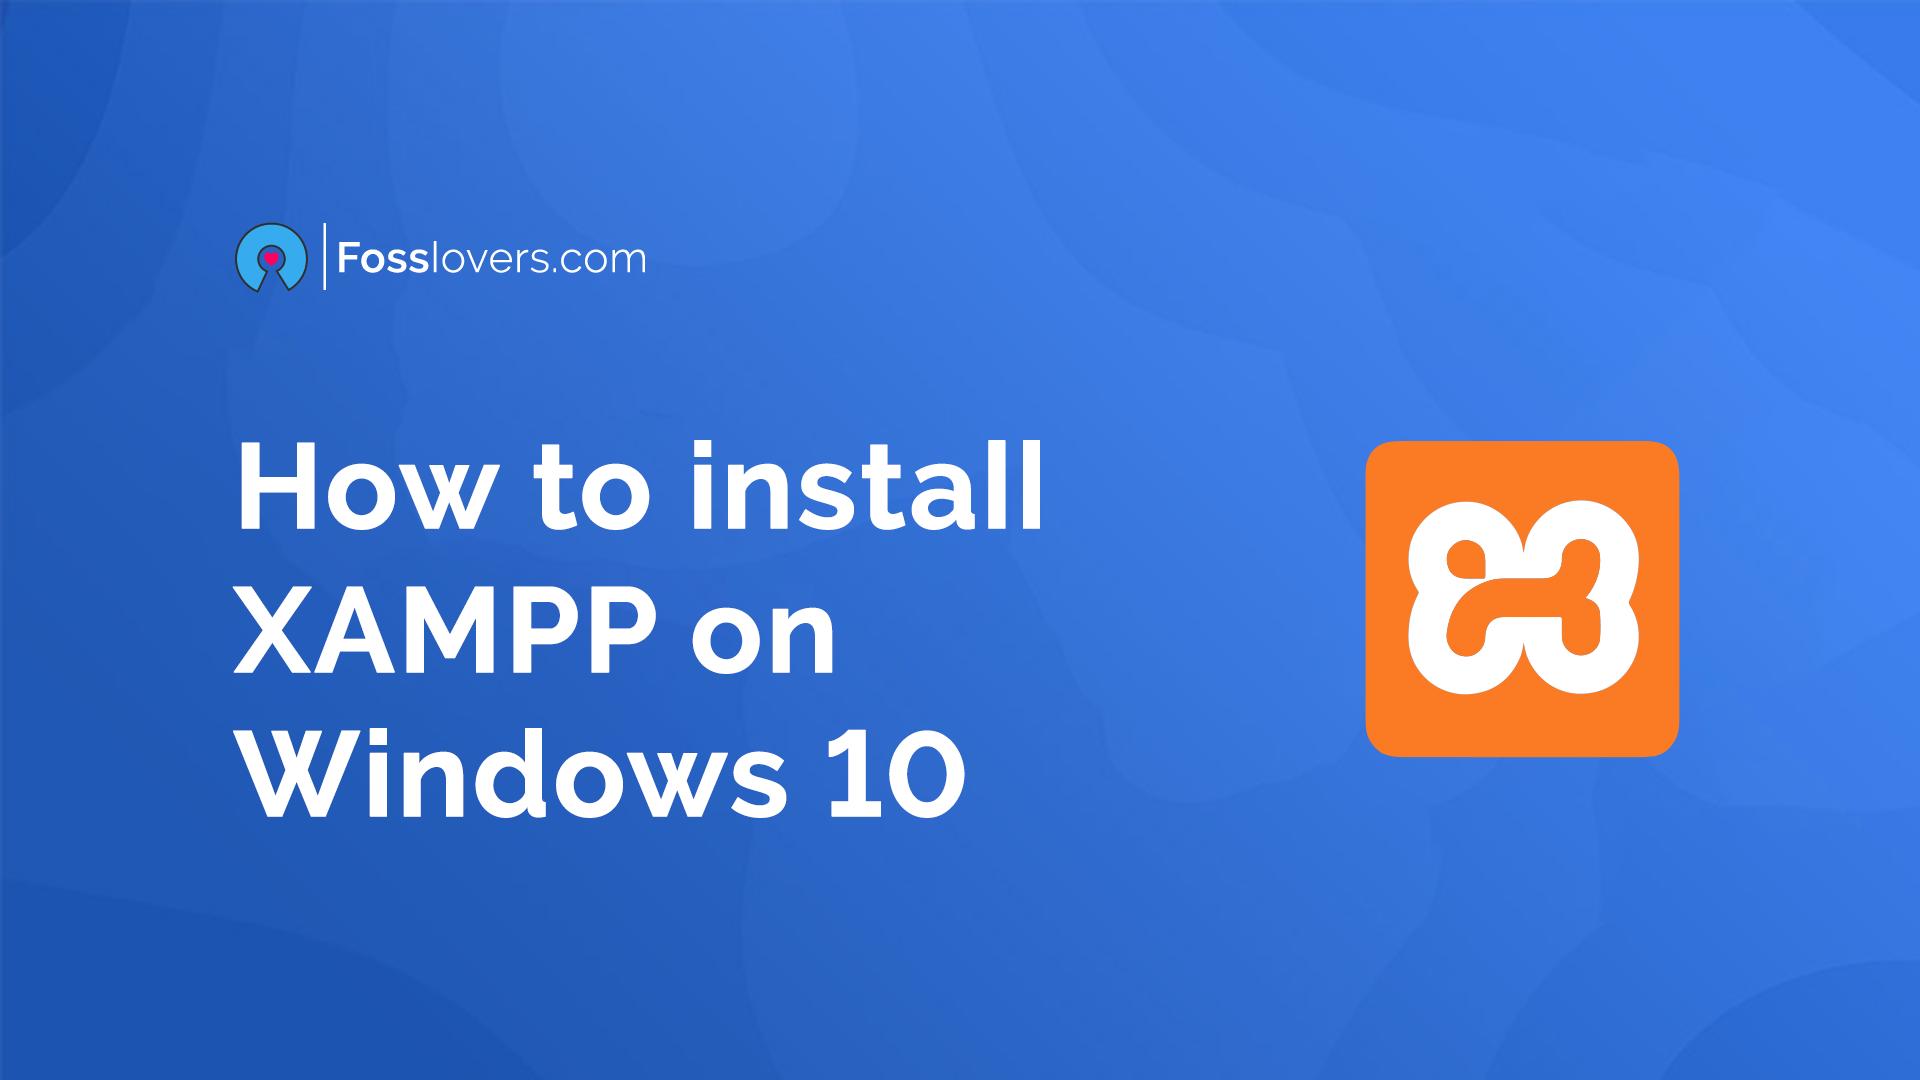 How to Install XAMPP in Windows 10